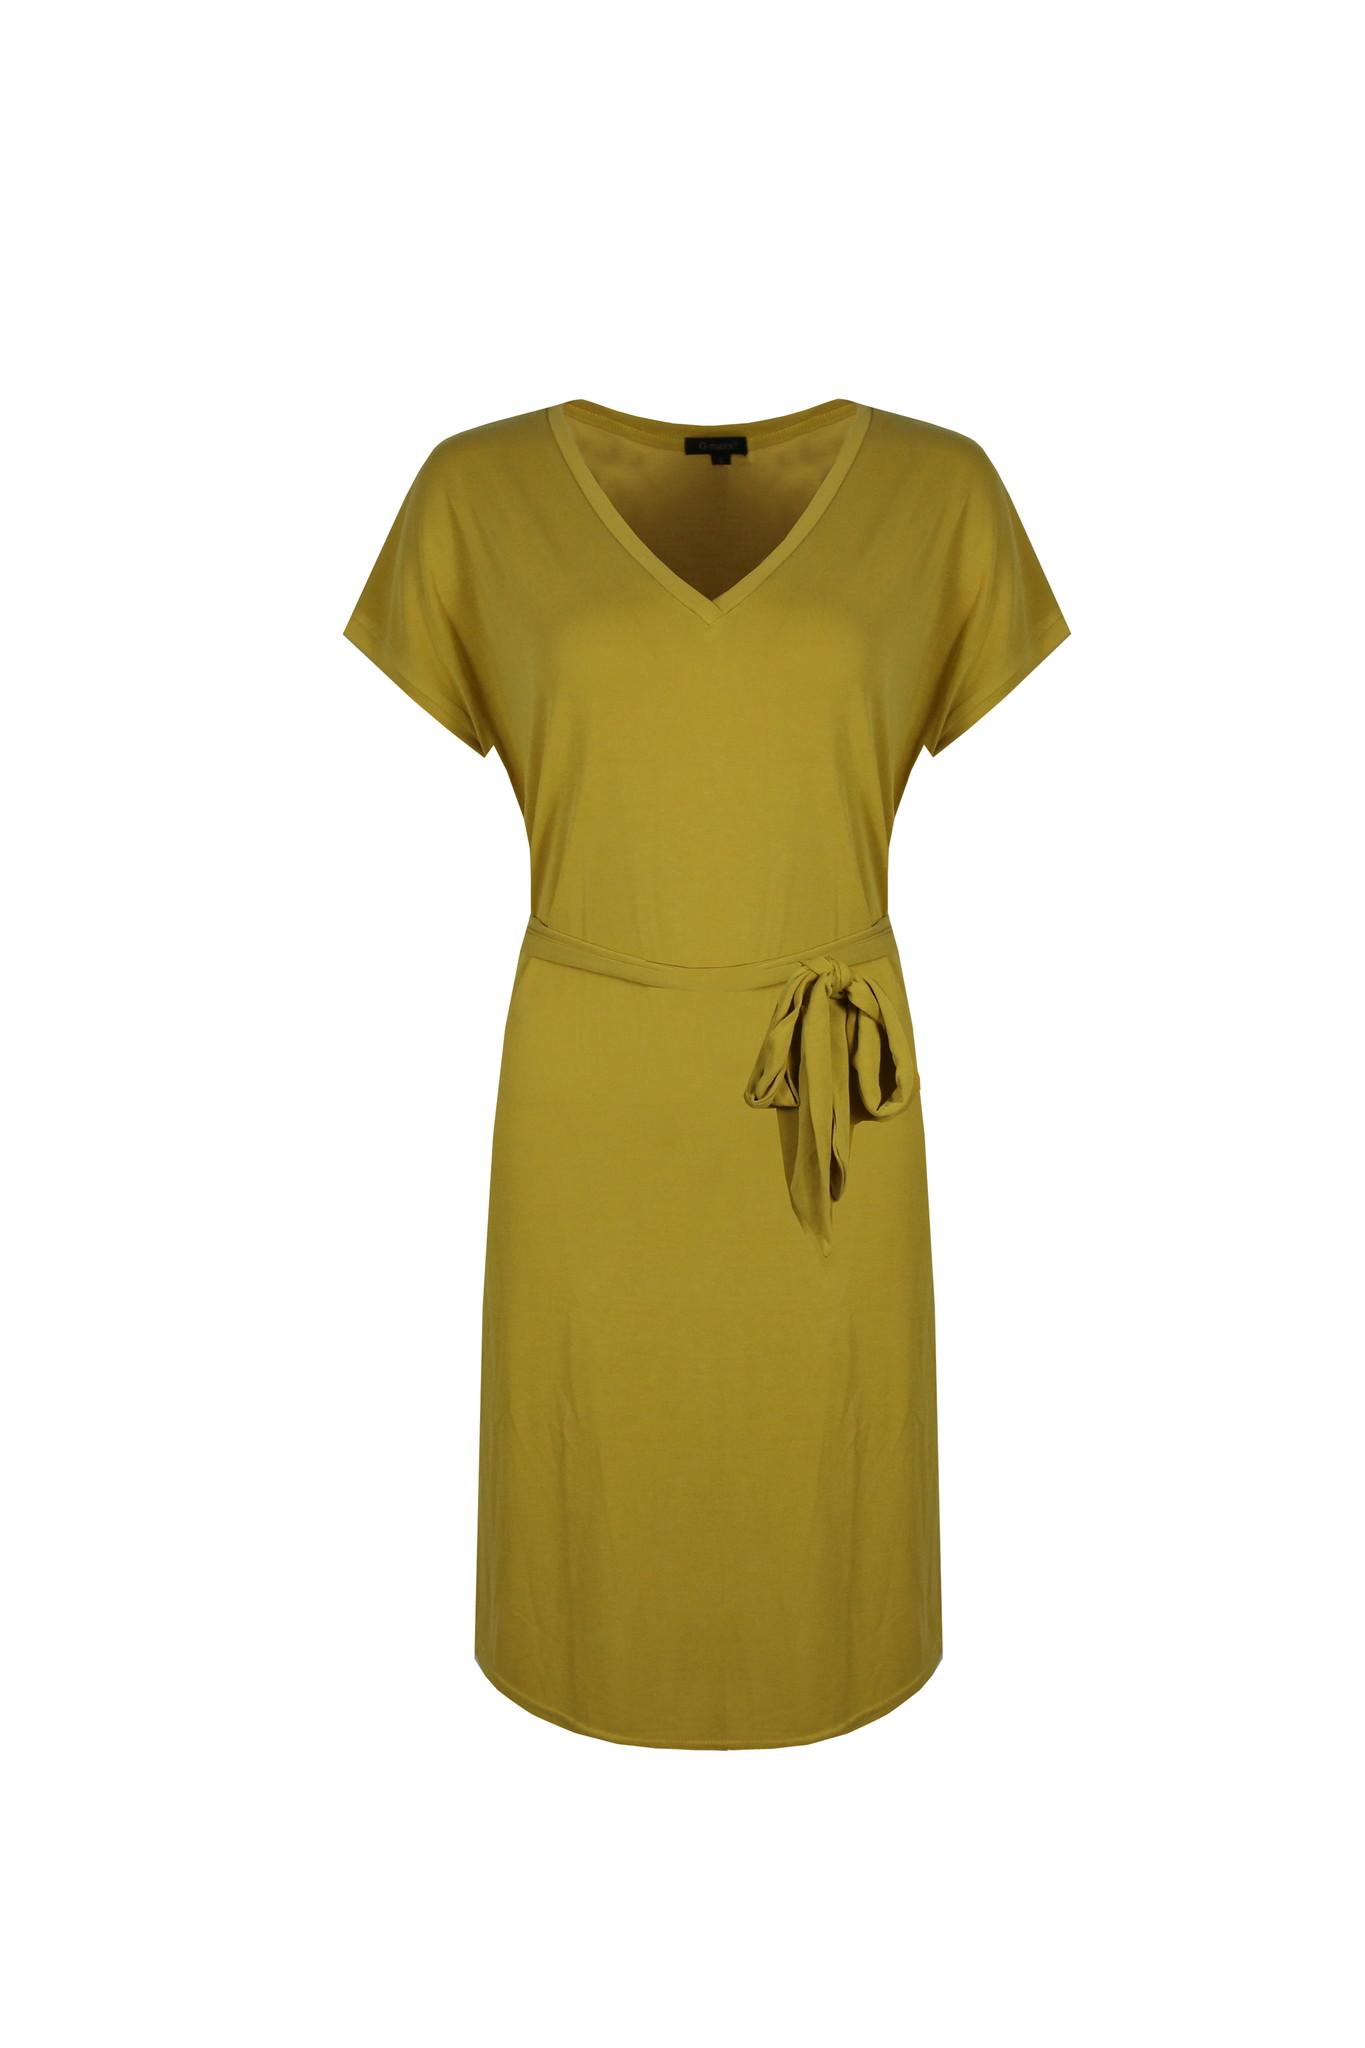 G-Maxx G-Maxx jurk Elin okergeel